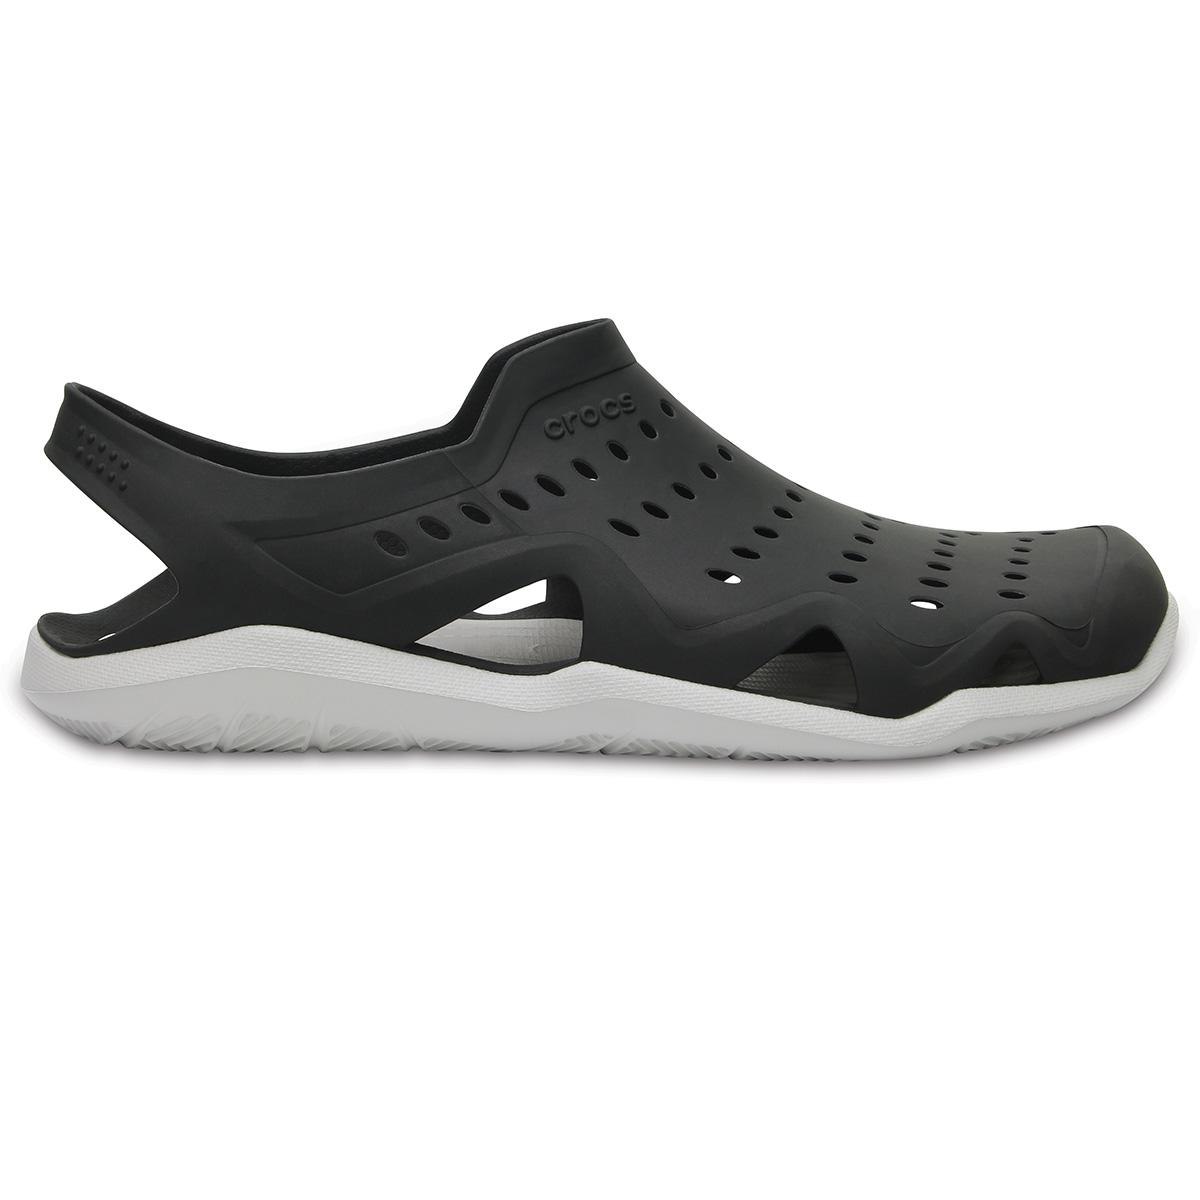 Crocs Swiftwater Wave M - Siyah/İnci Beyazı